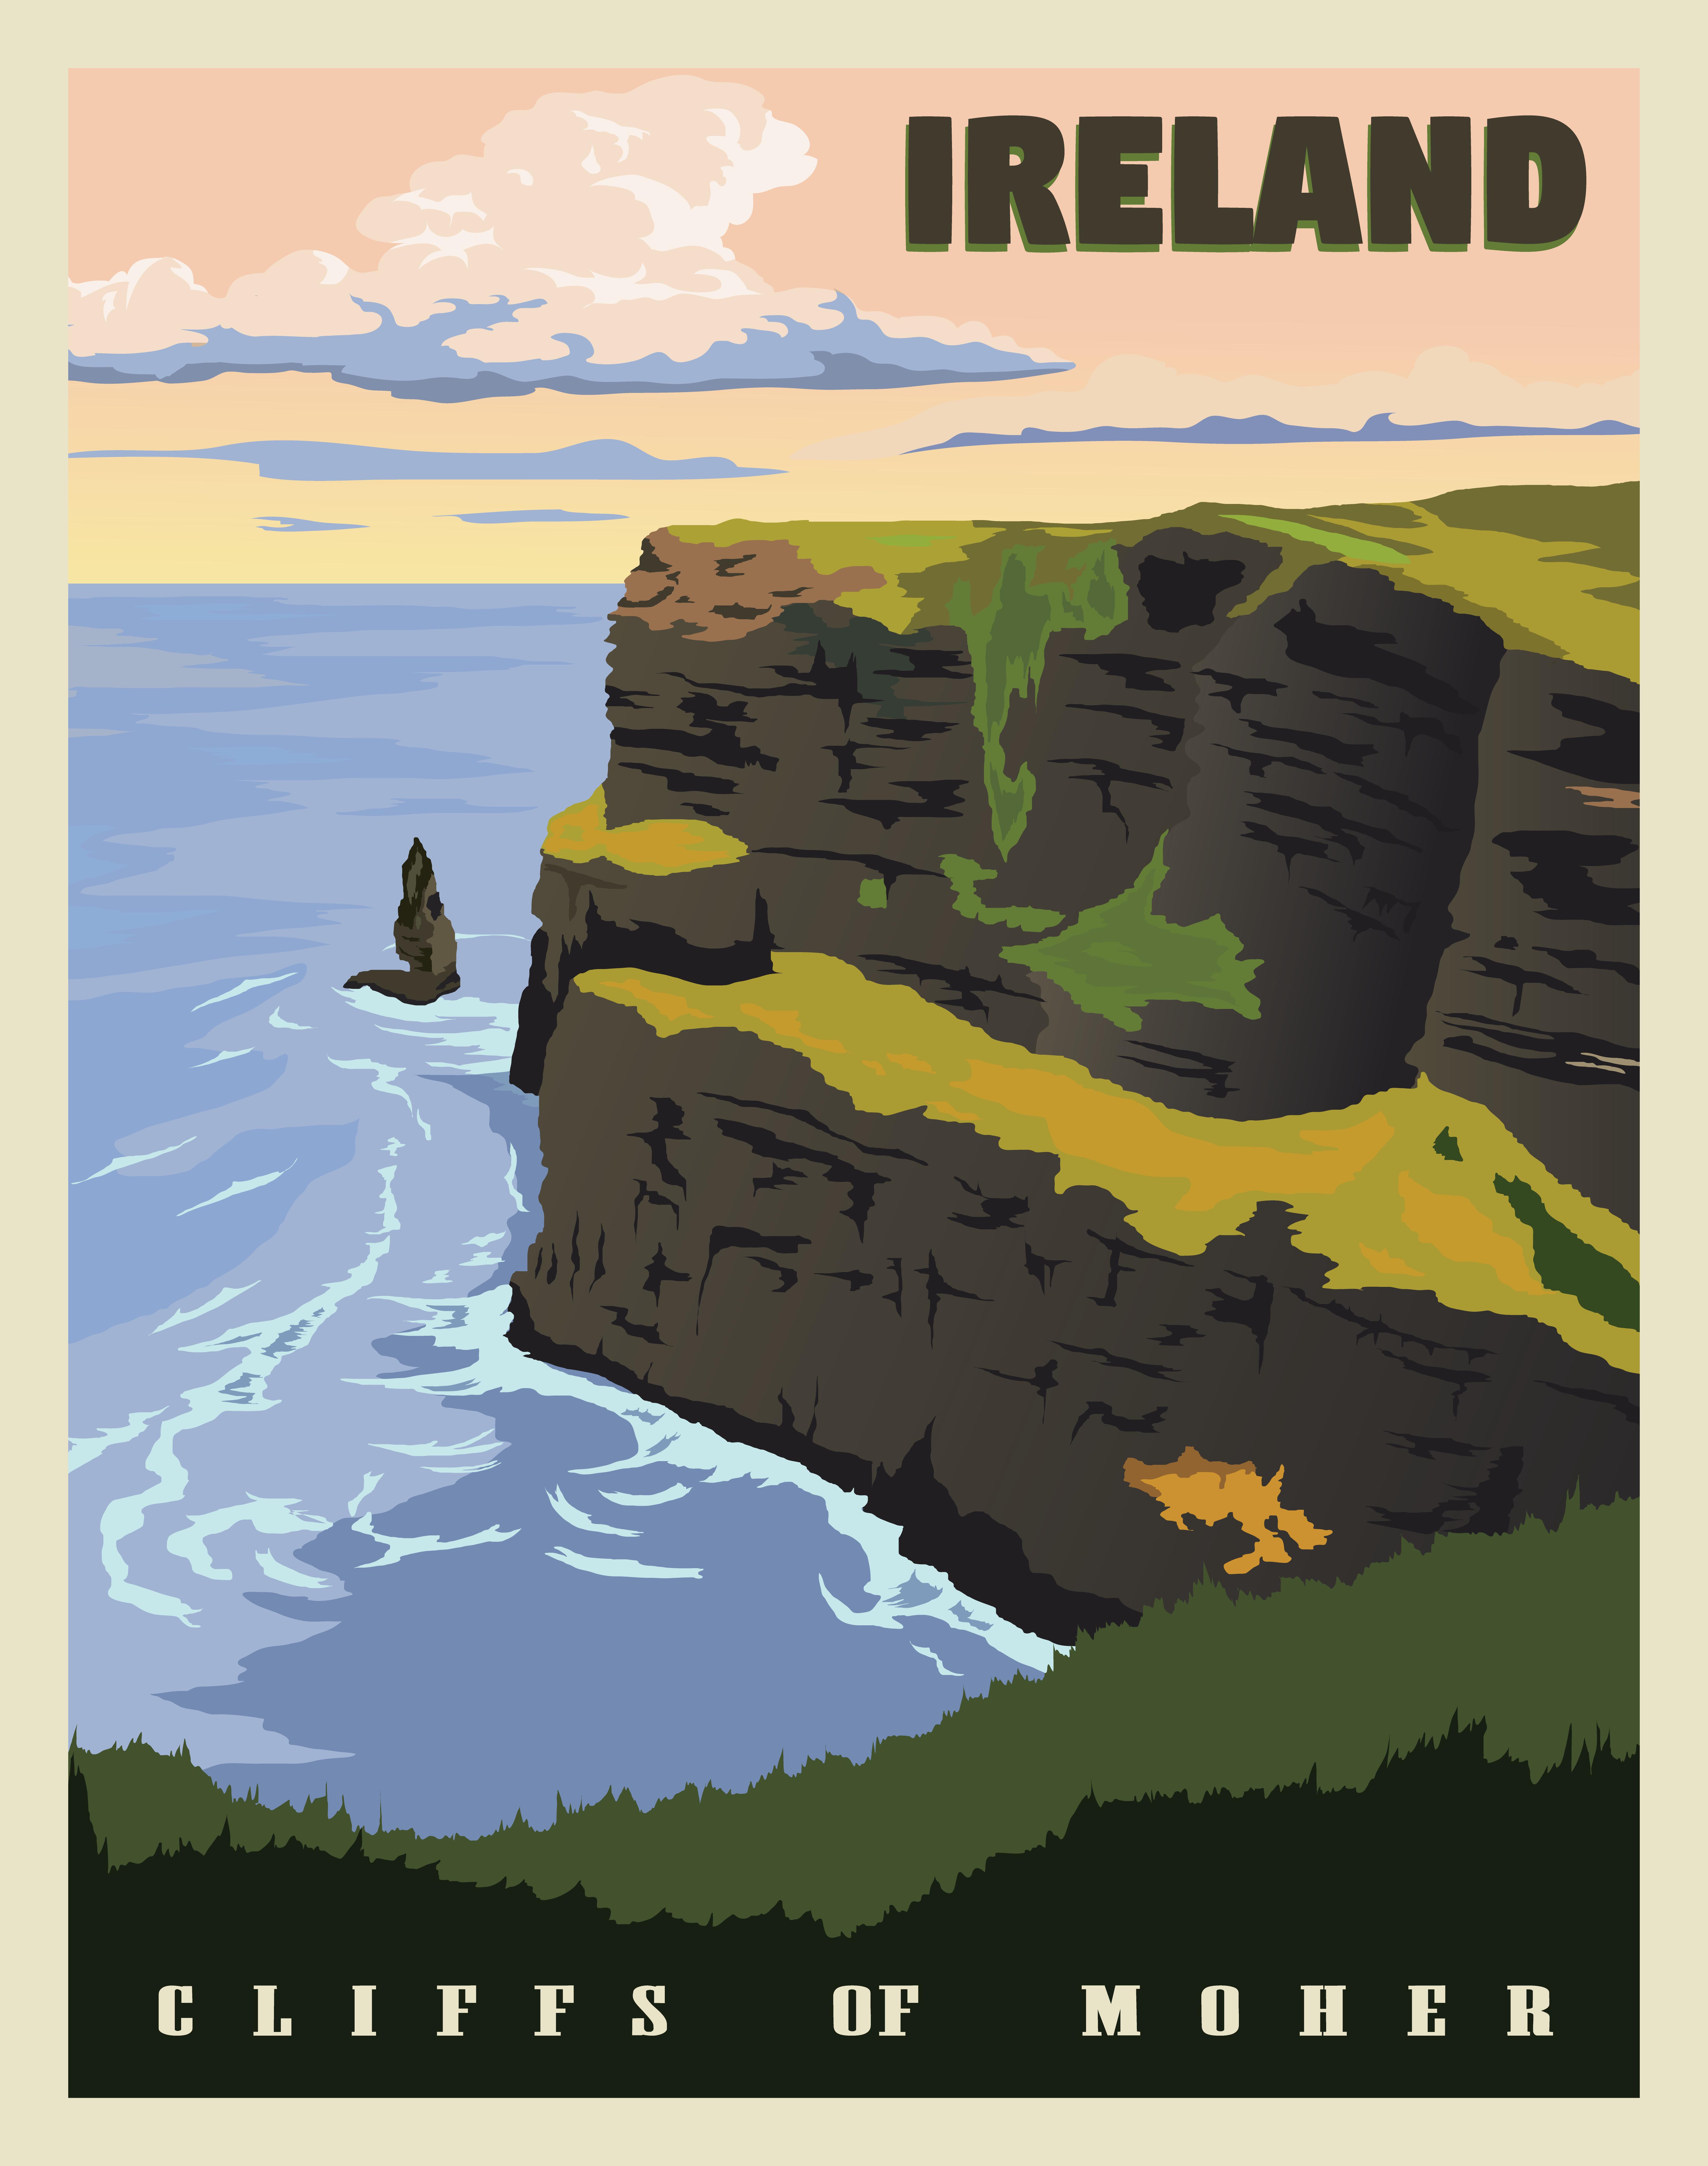 Ireland Vintage Style Travel Posters Travel Posters Art Deco Retro Travel Poster Vintage Poster Art